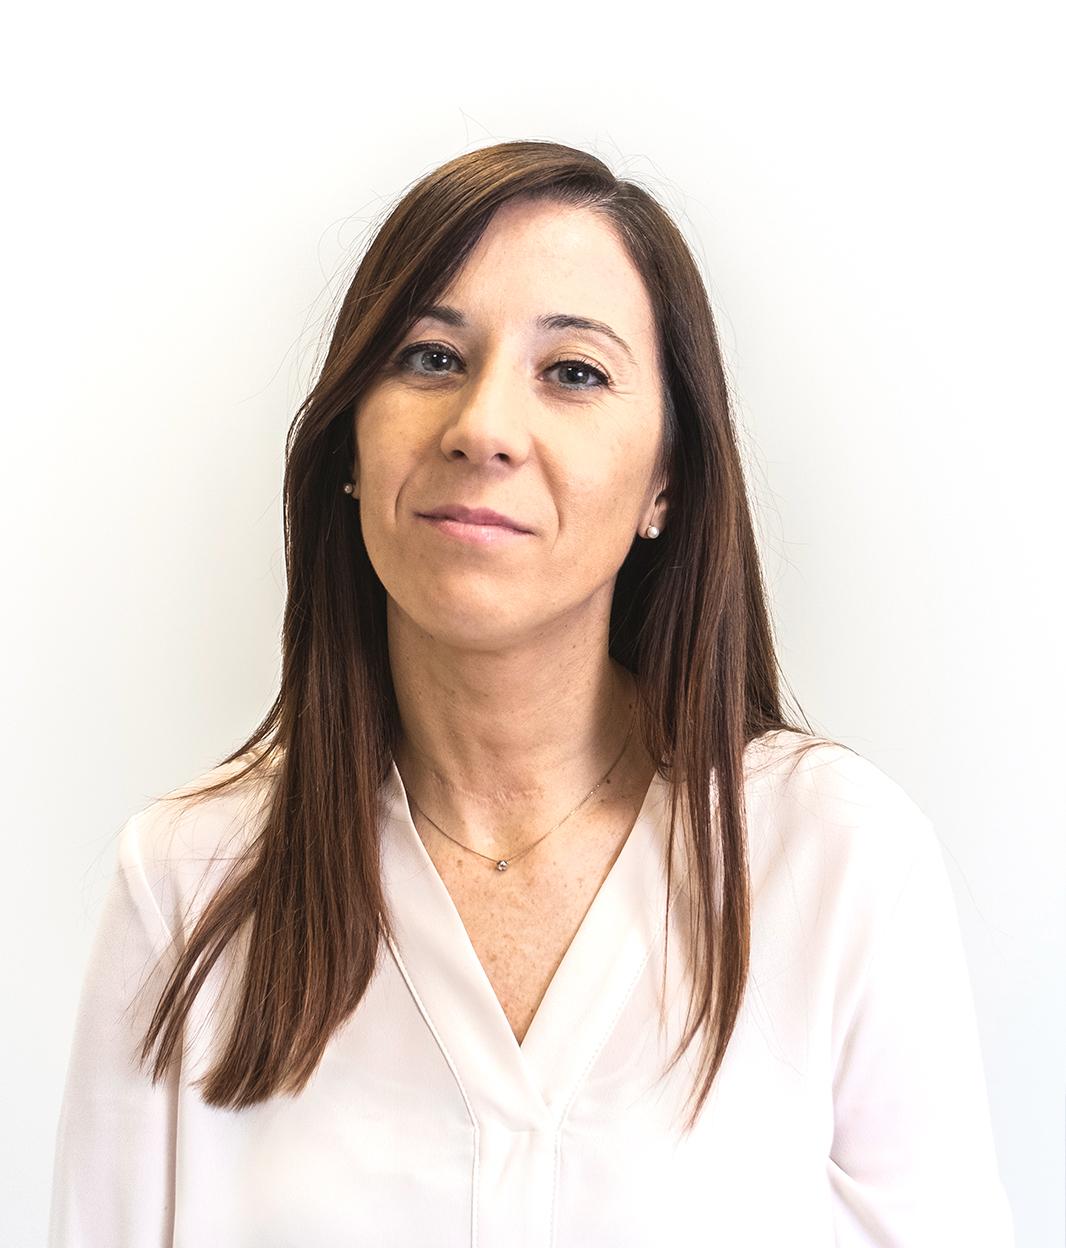 Cristina Cominotti